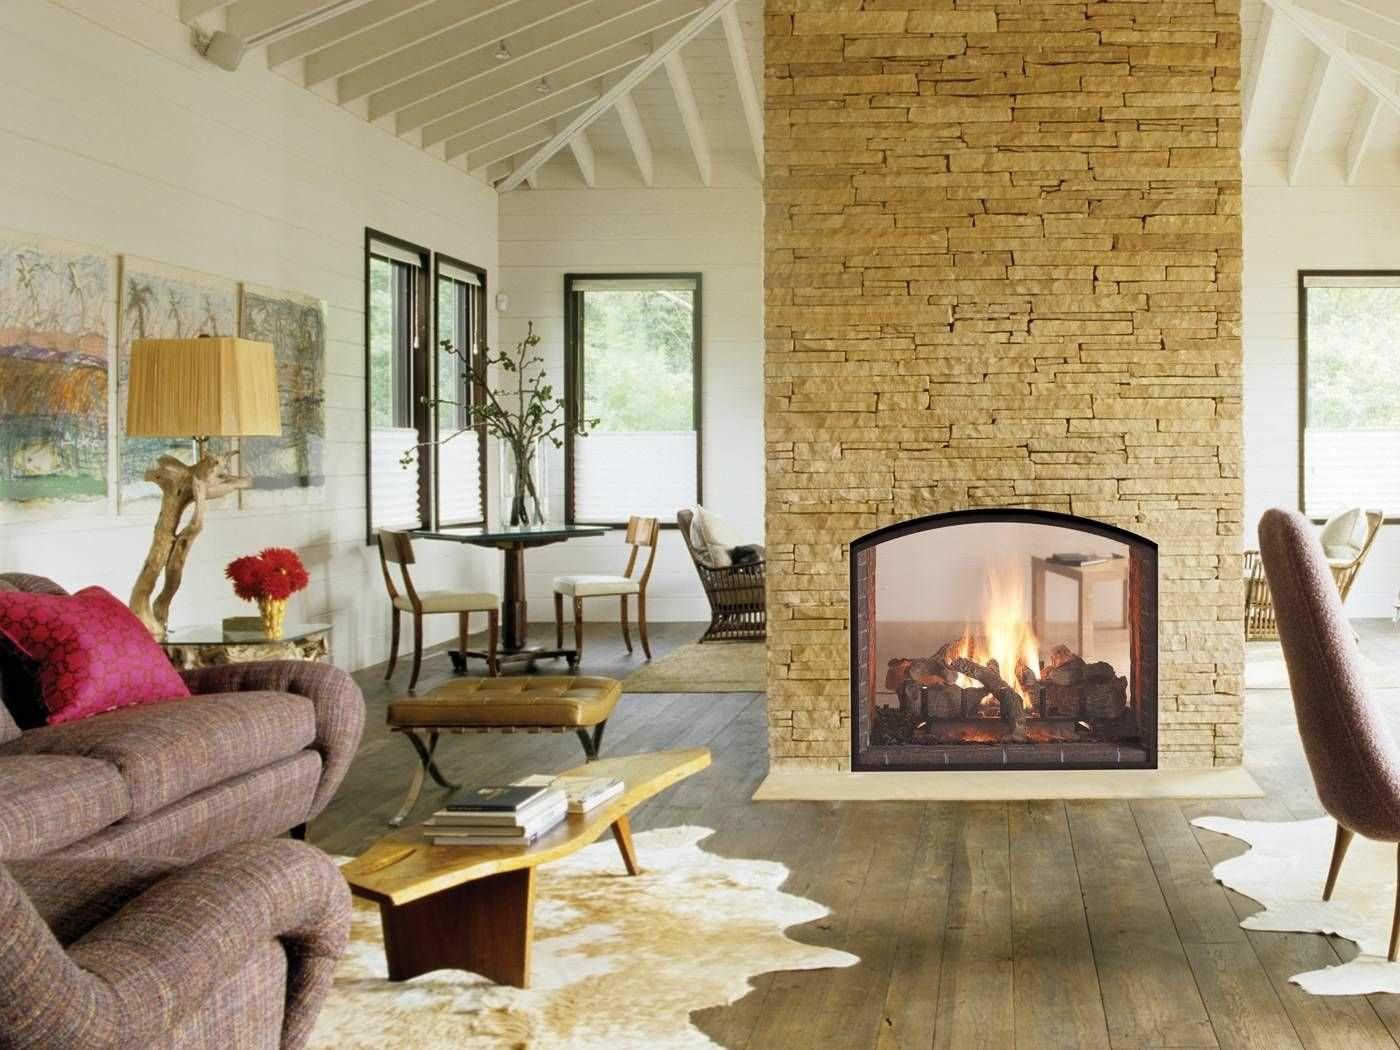 Davinci Custom Fireplace New Fireplace Gallery Of West Michigan Fireplacegallerywm On